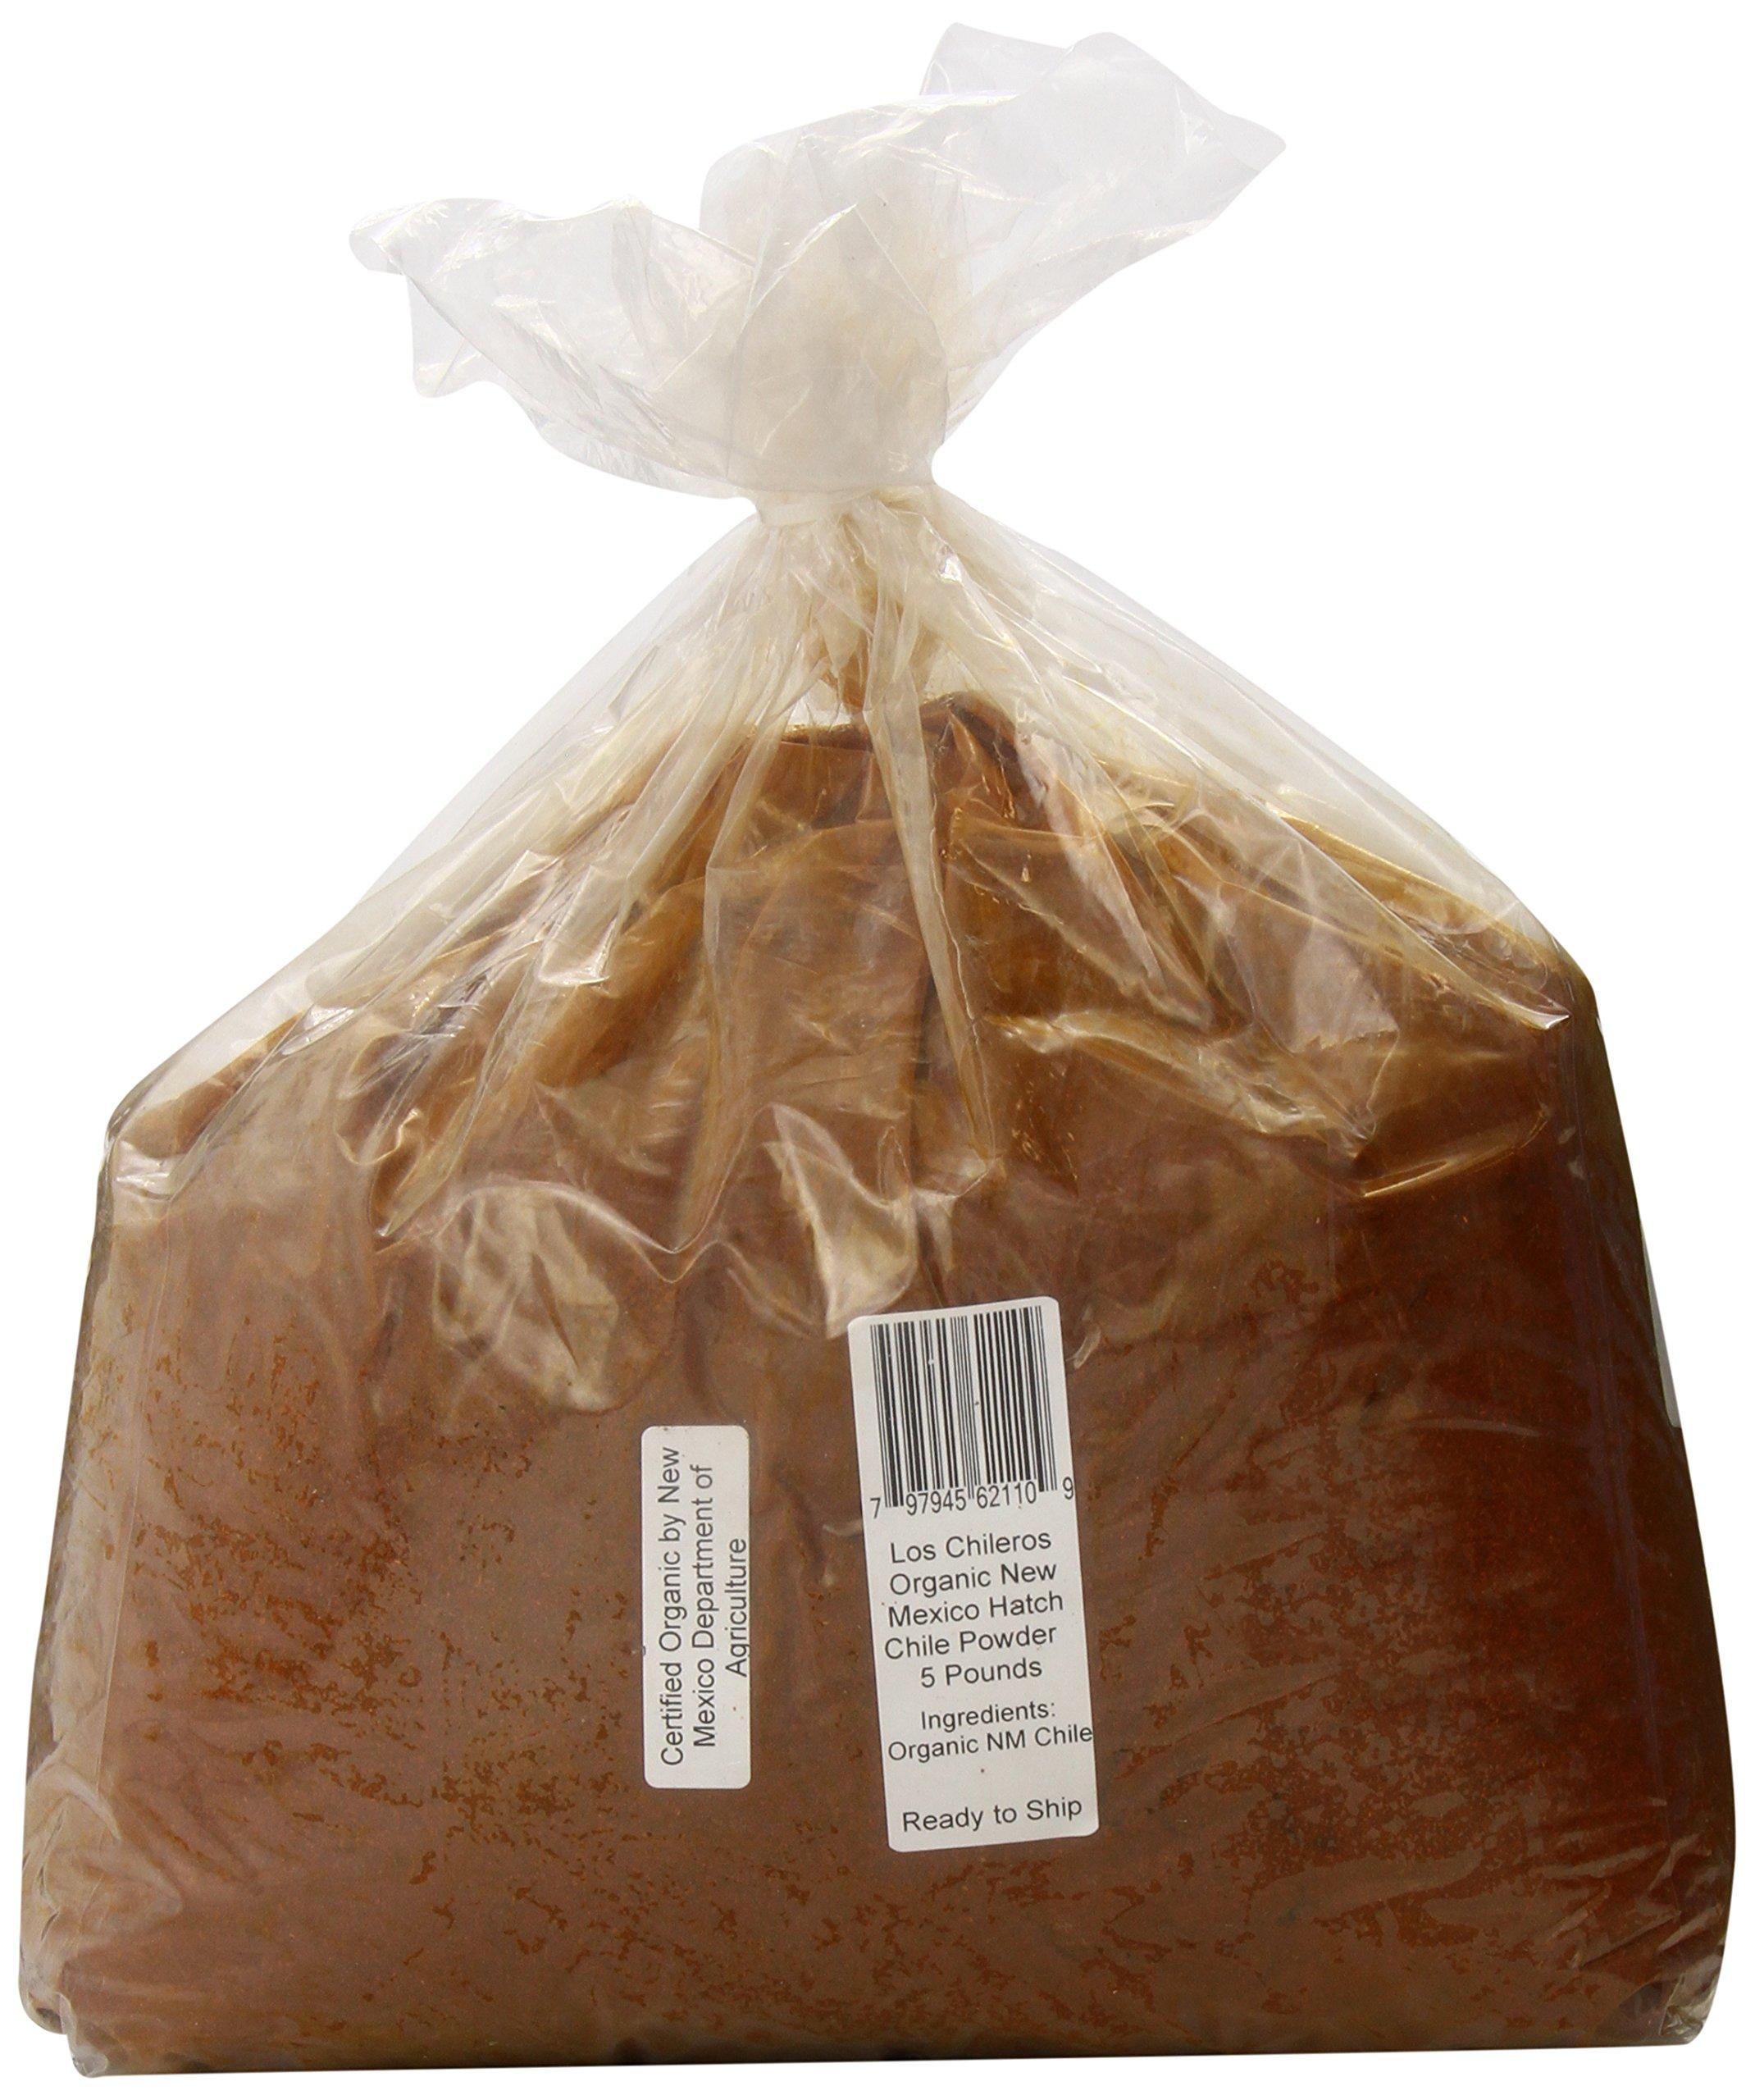 Los Chileros Organic New Mexico Hatch Chile, Powder, 5 Pound